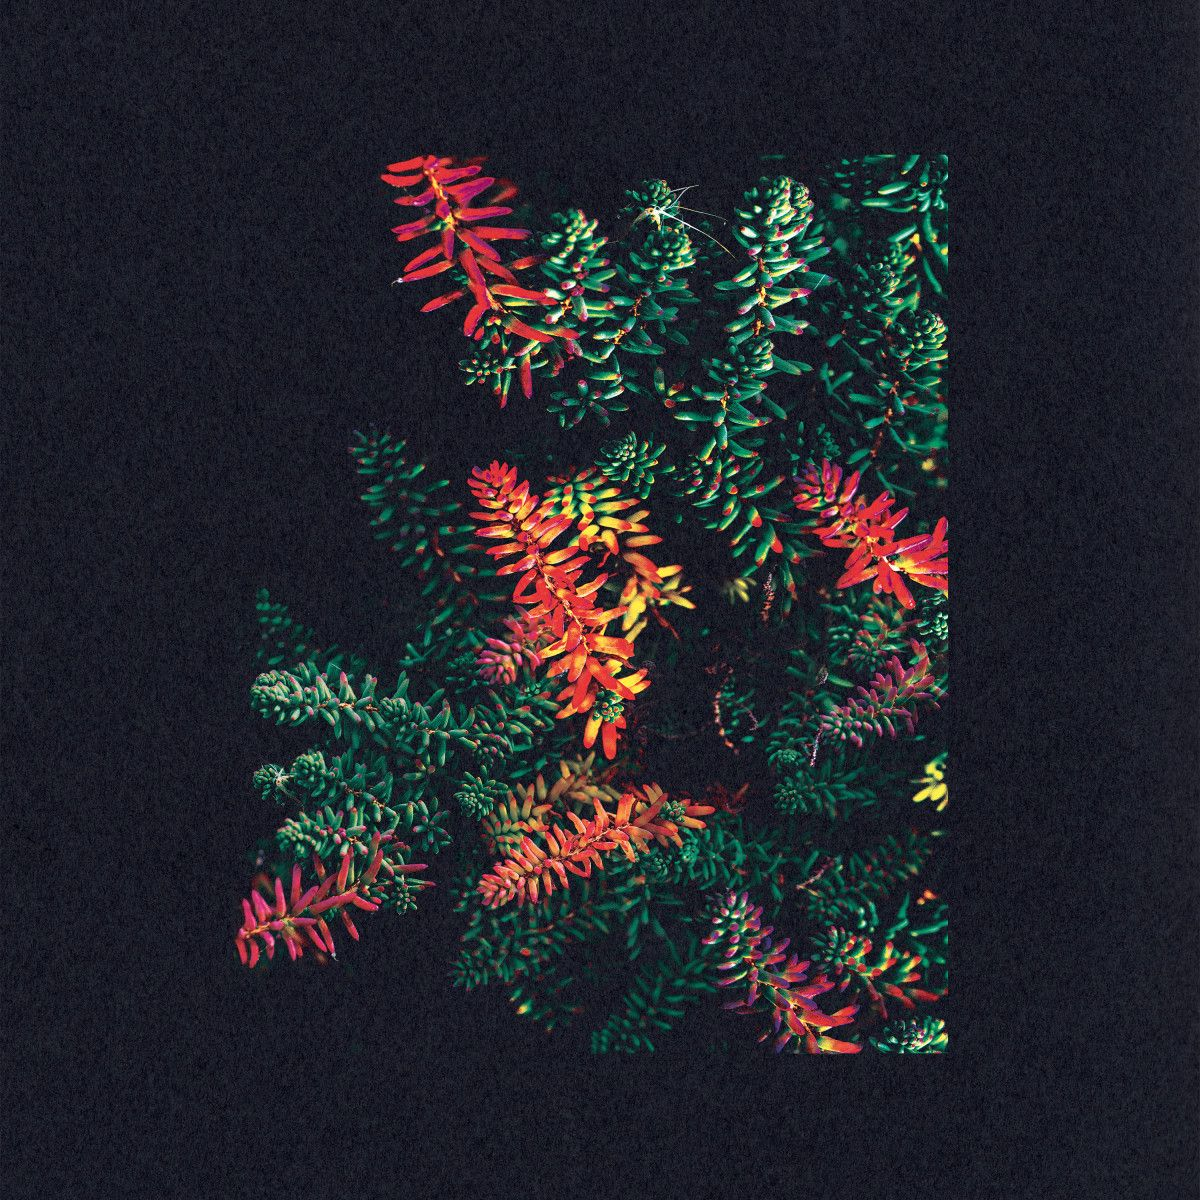 23. Dark Sky - Othona